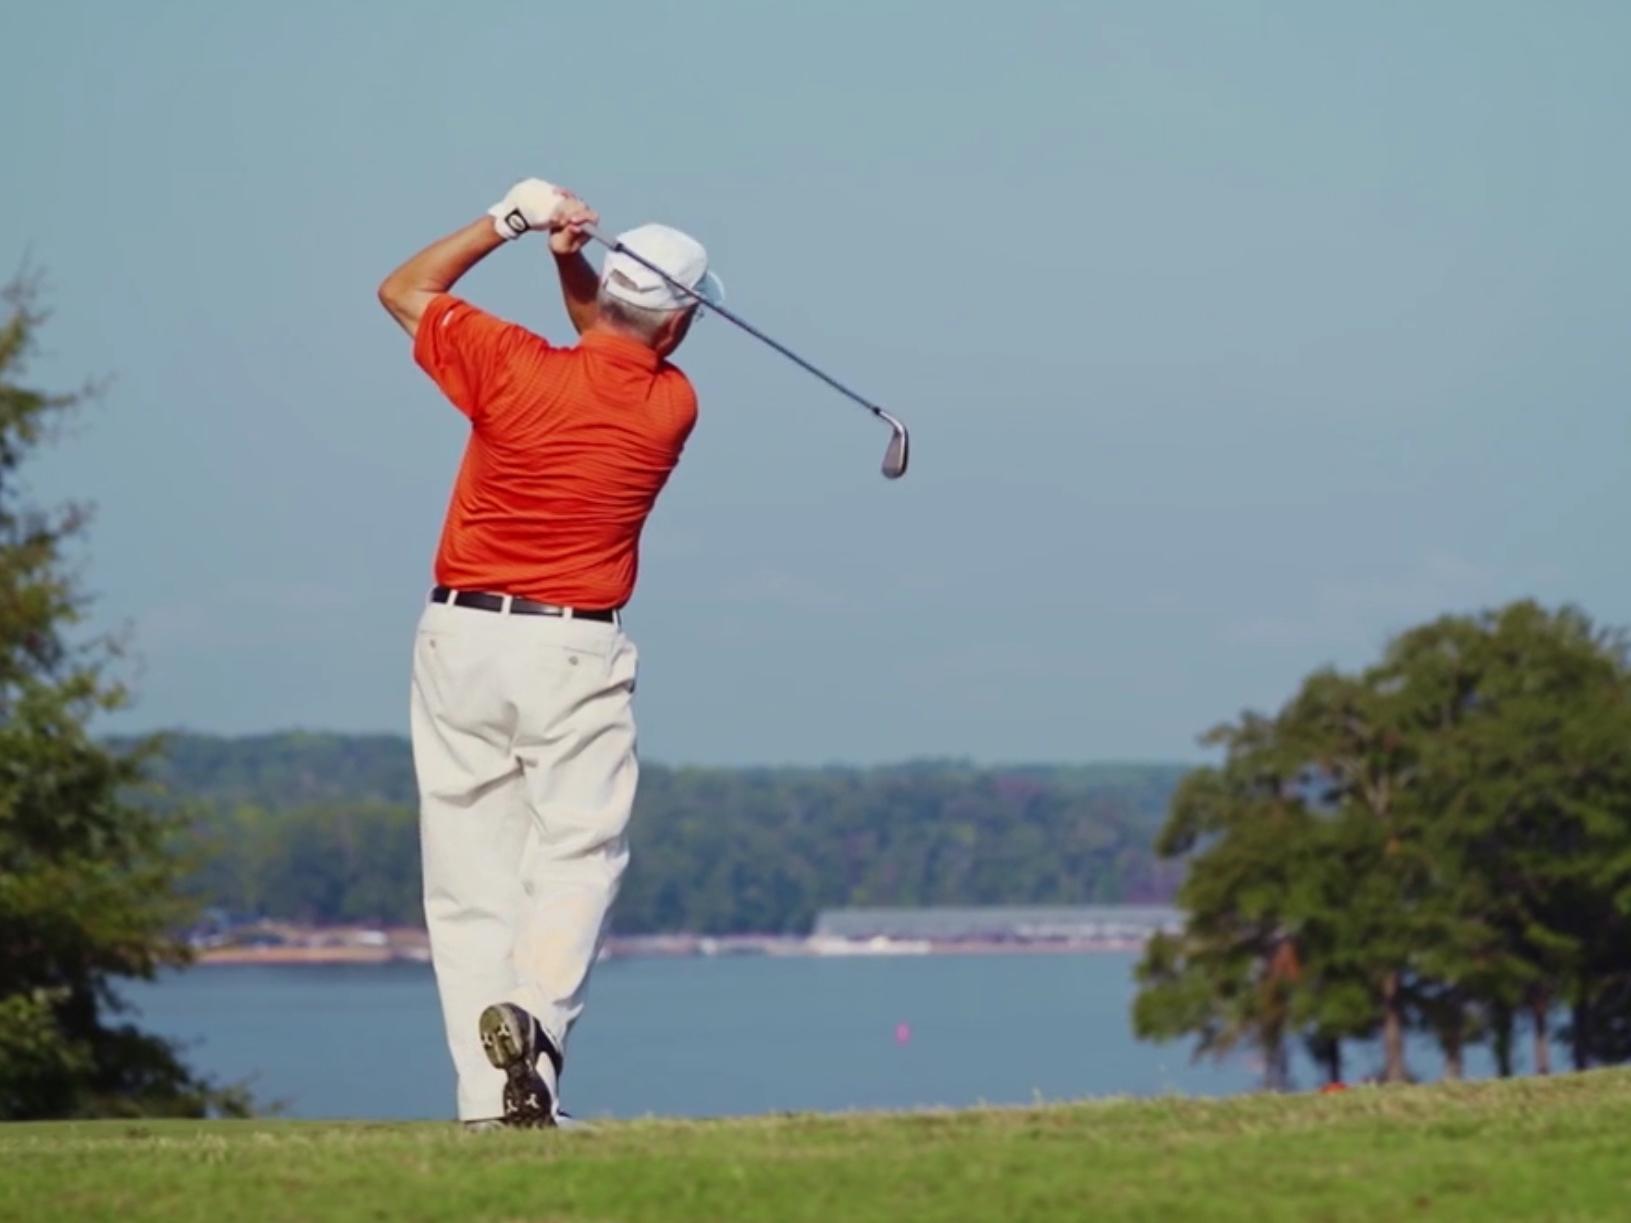 man golfing in orange polo